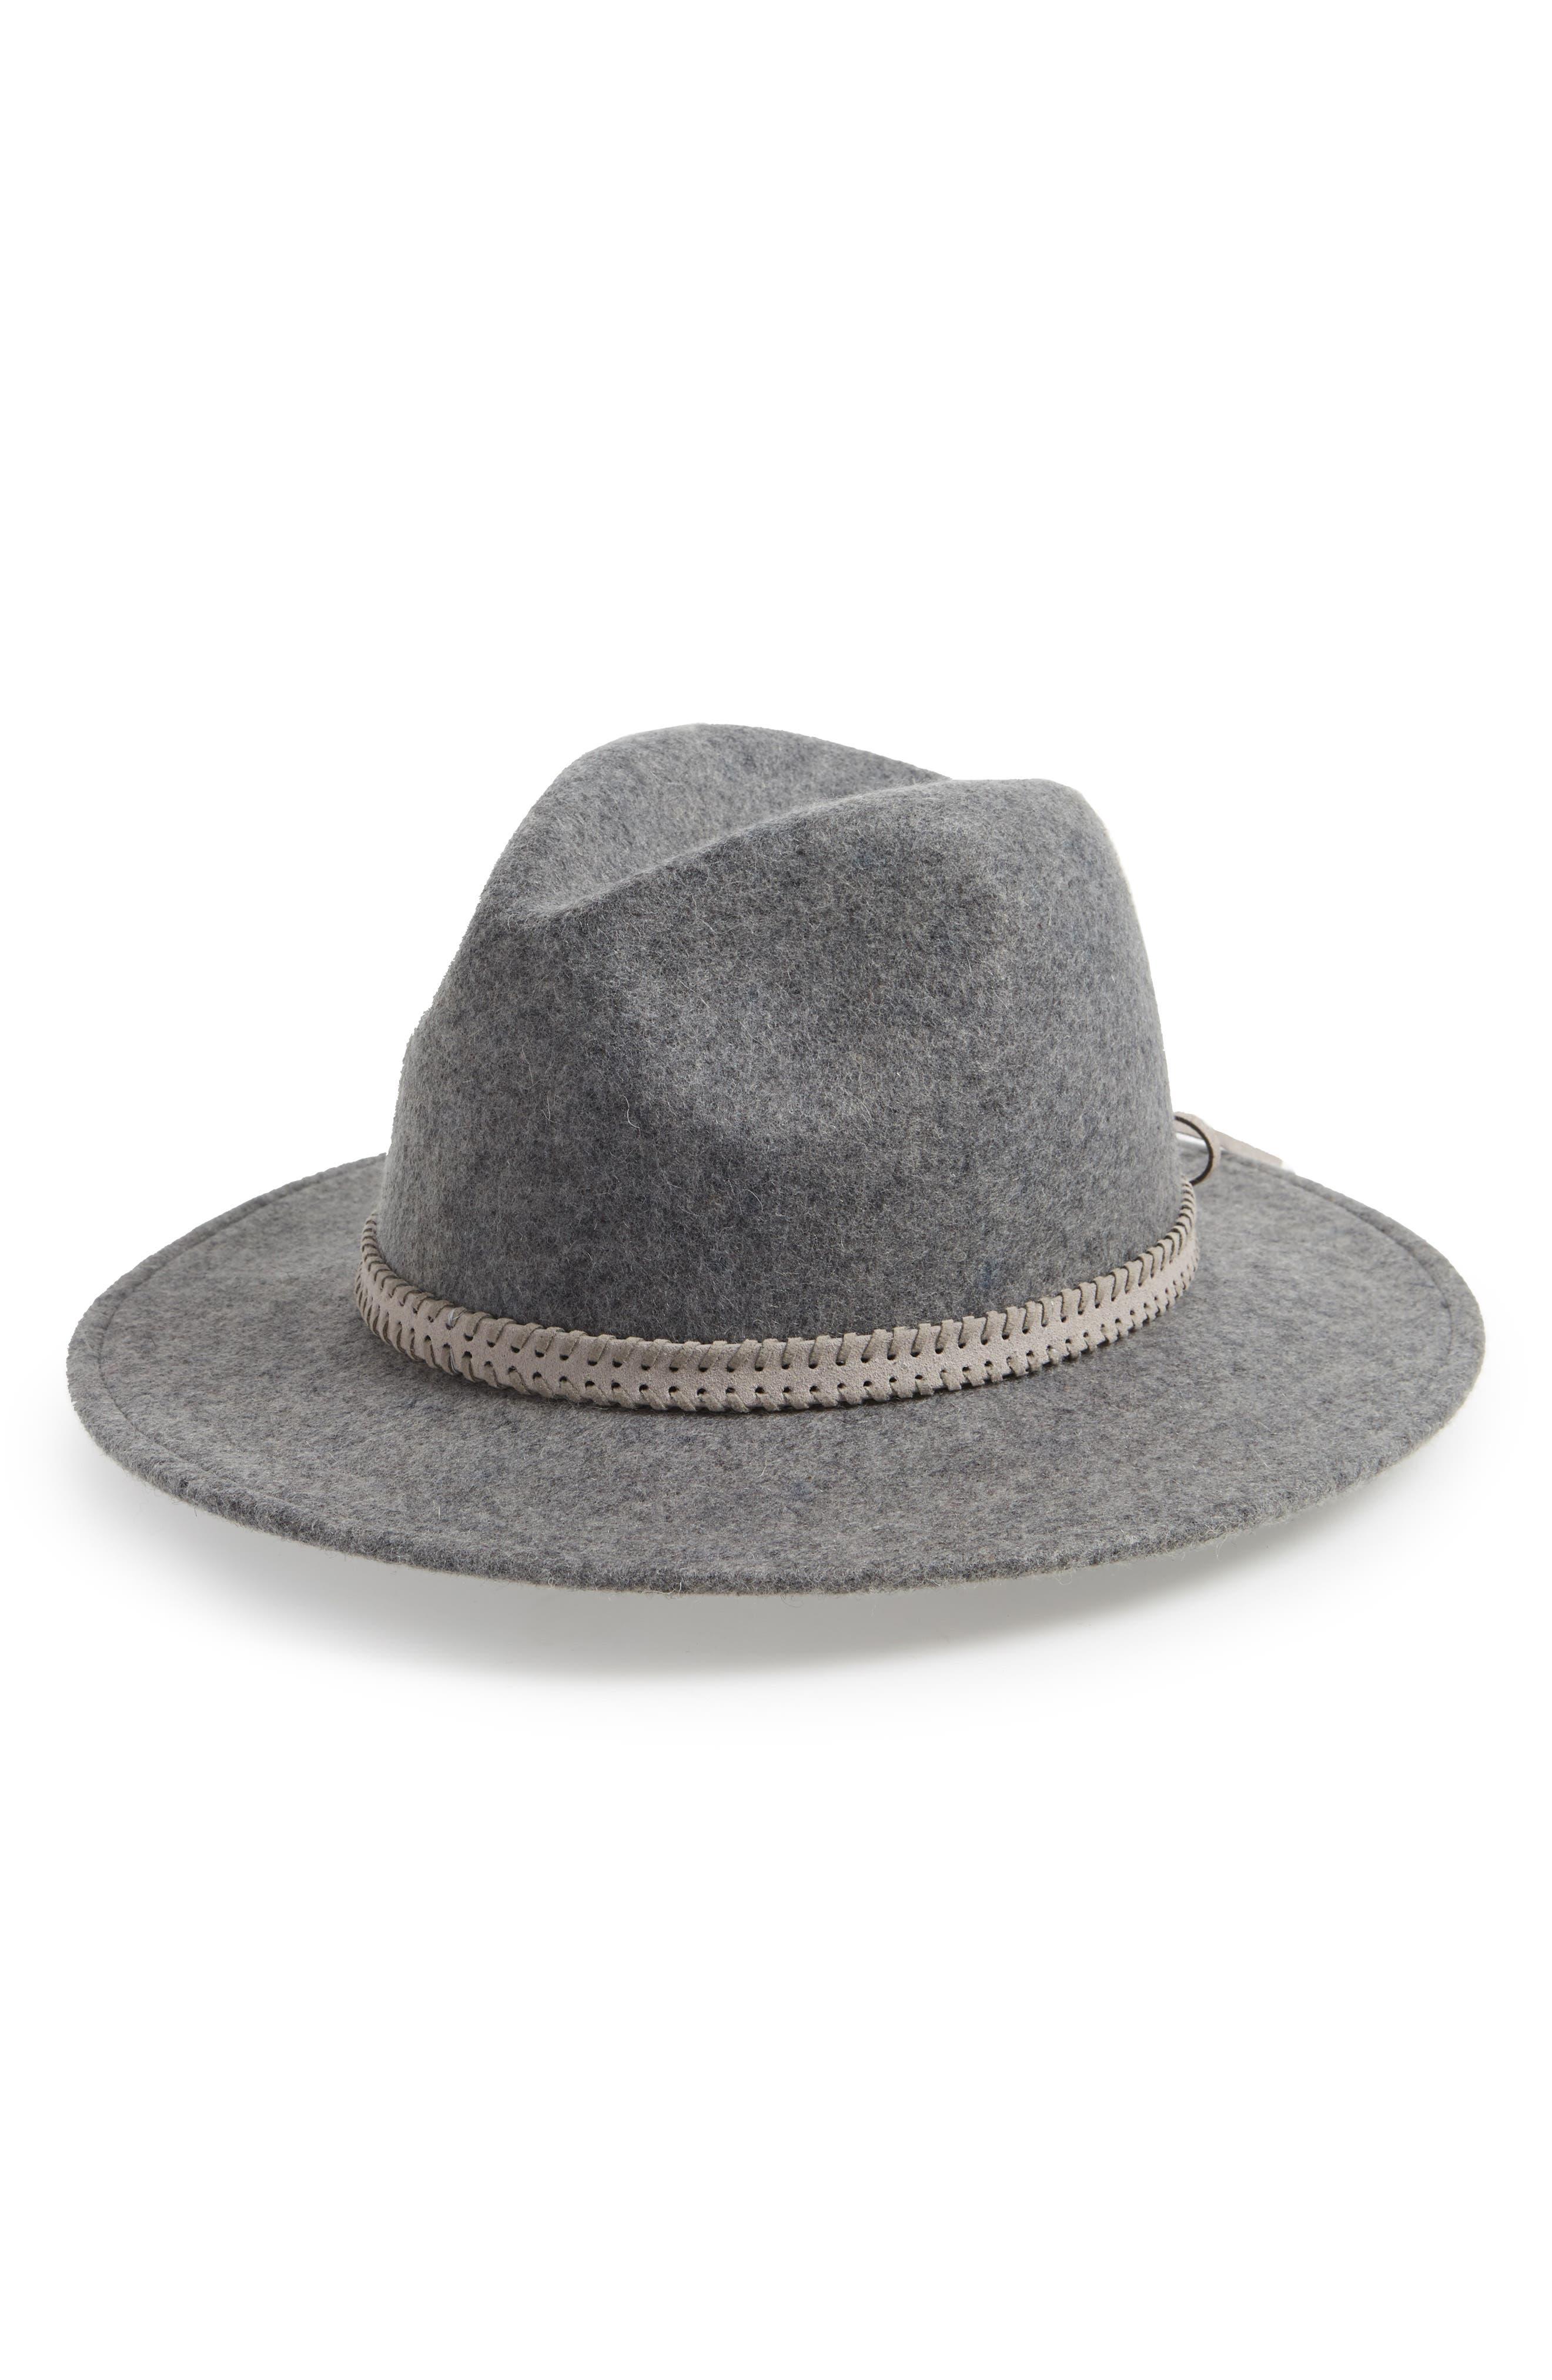 Felt Panama Hat,                         Main,                         color, GREY LIGHT HEATHER